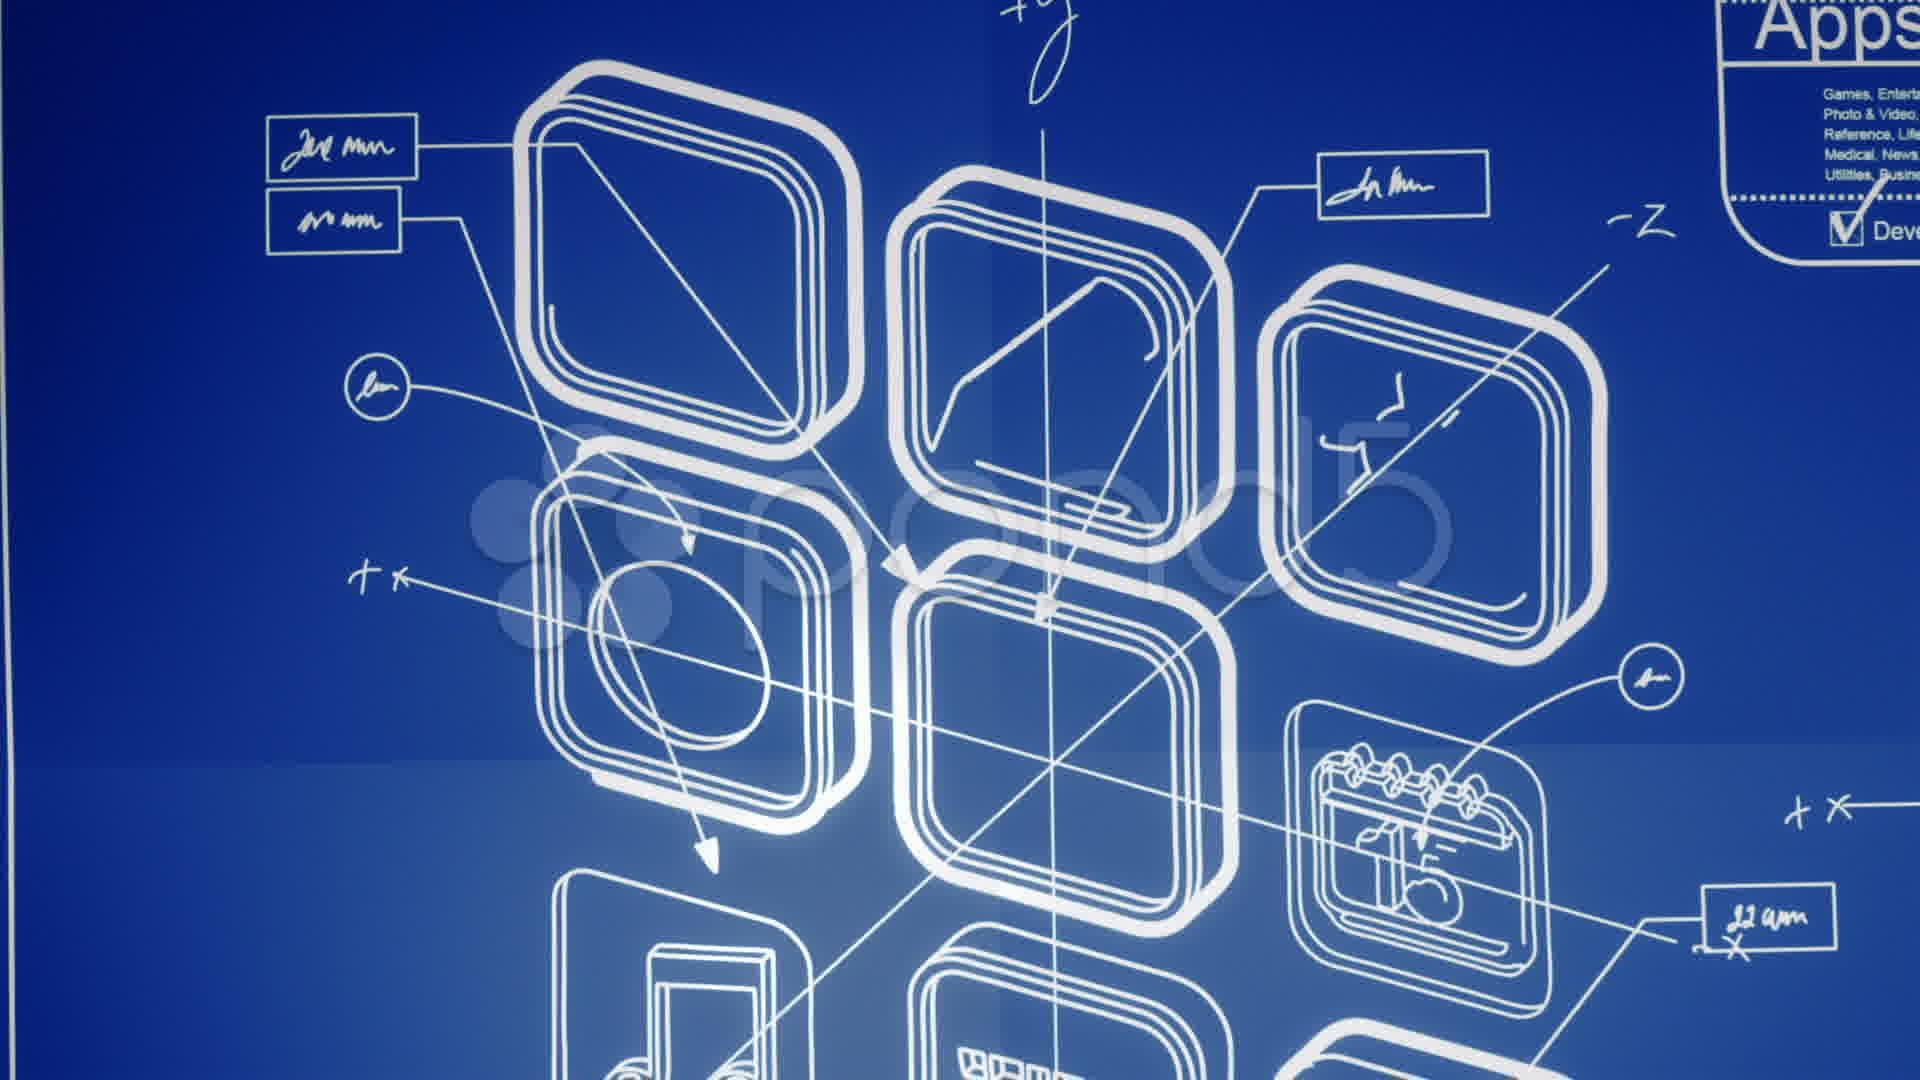 Mobile app development blueprint concept video 010597915 for App for blueprints